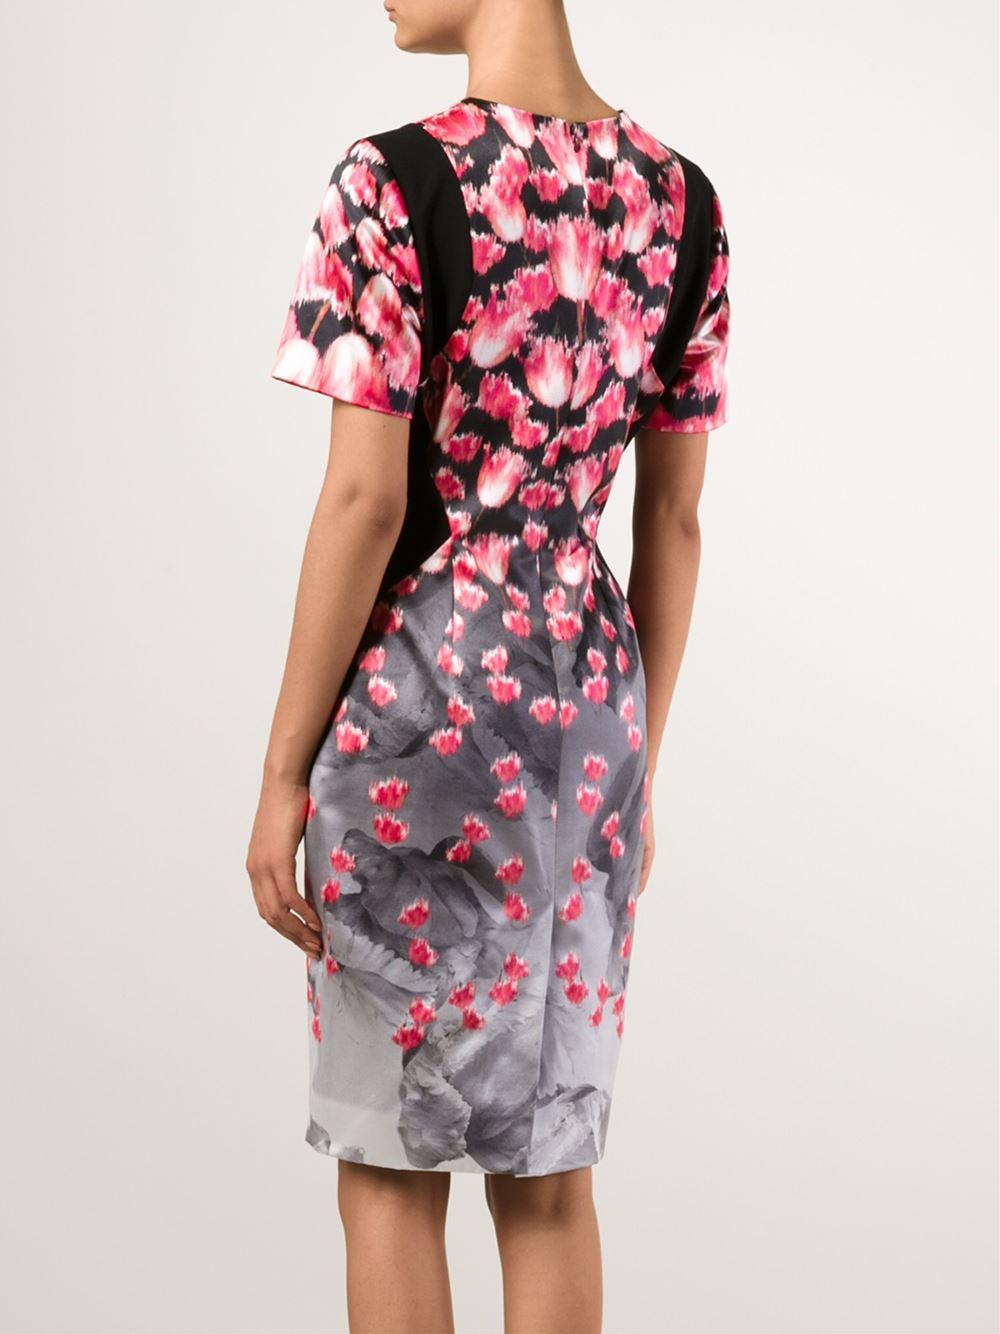 Prabal gurung Tulip-Print Degradé Dress in Pink (pink & purple ...